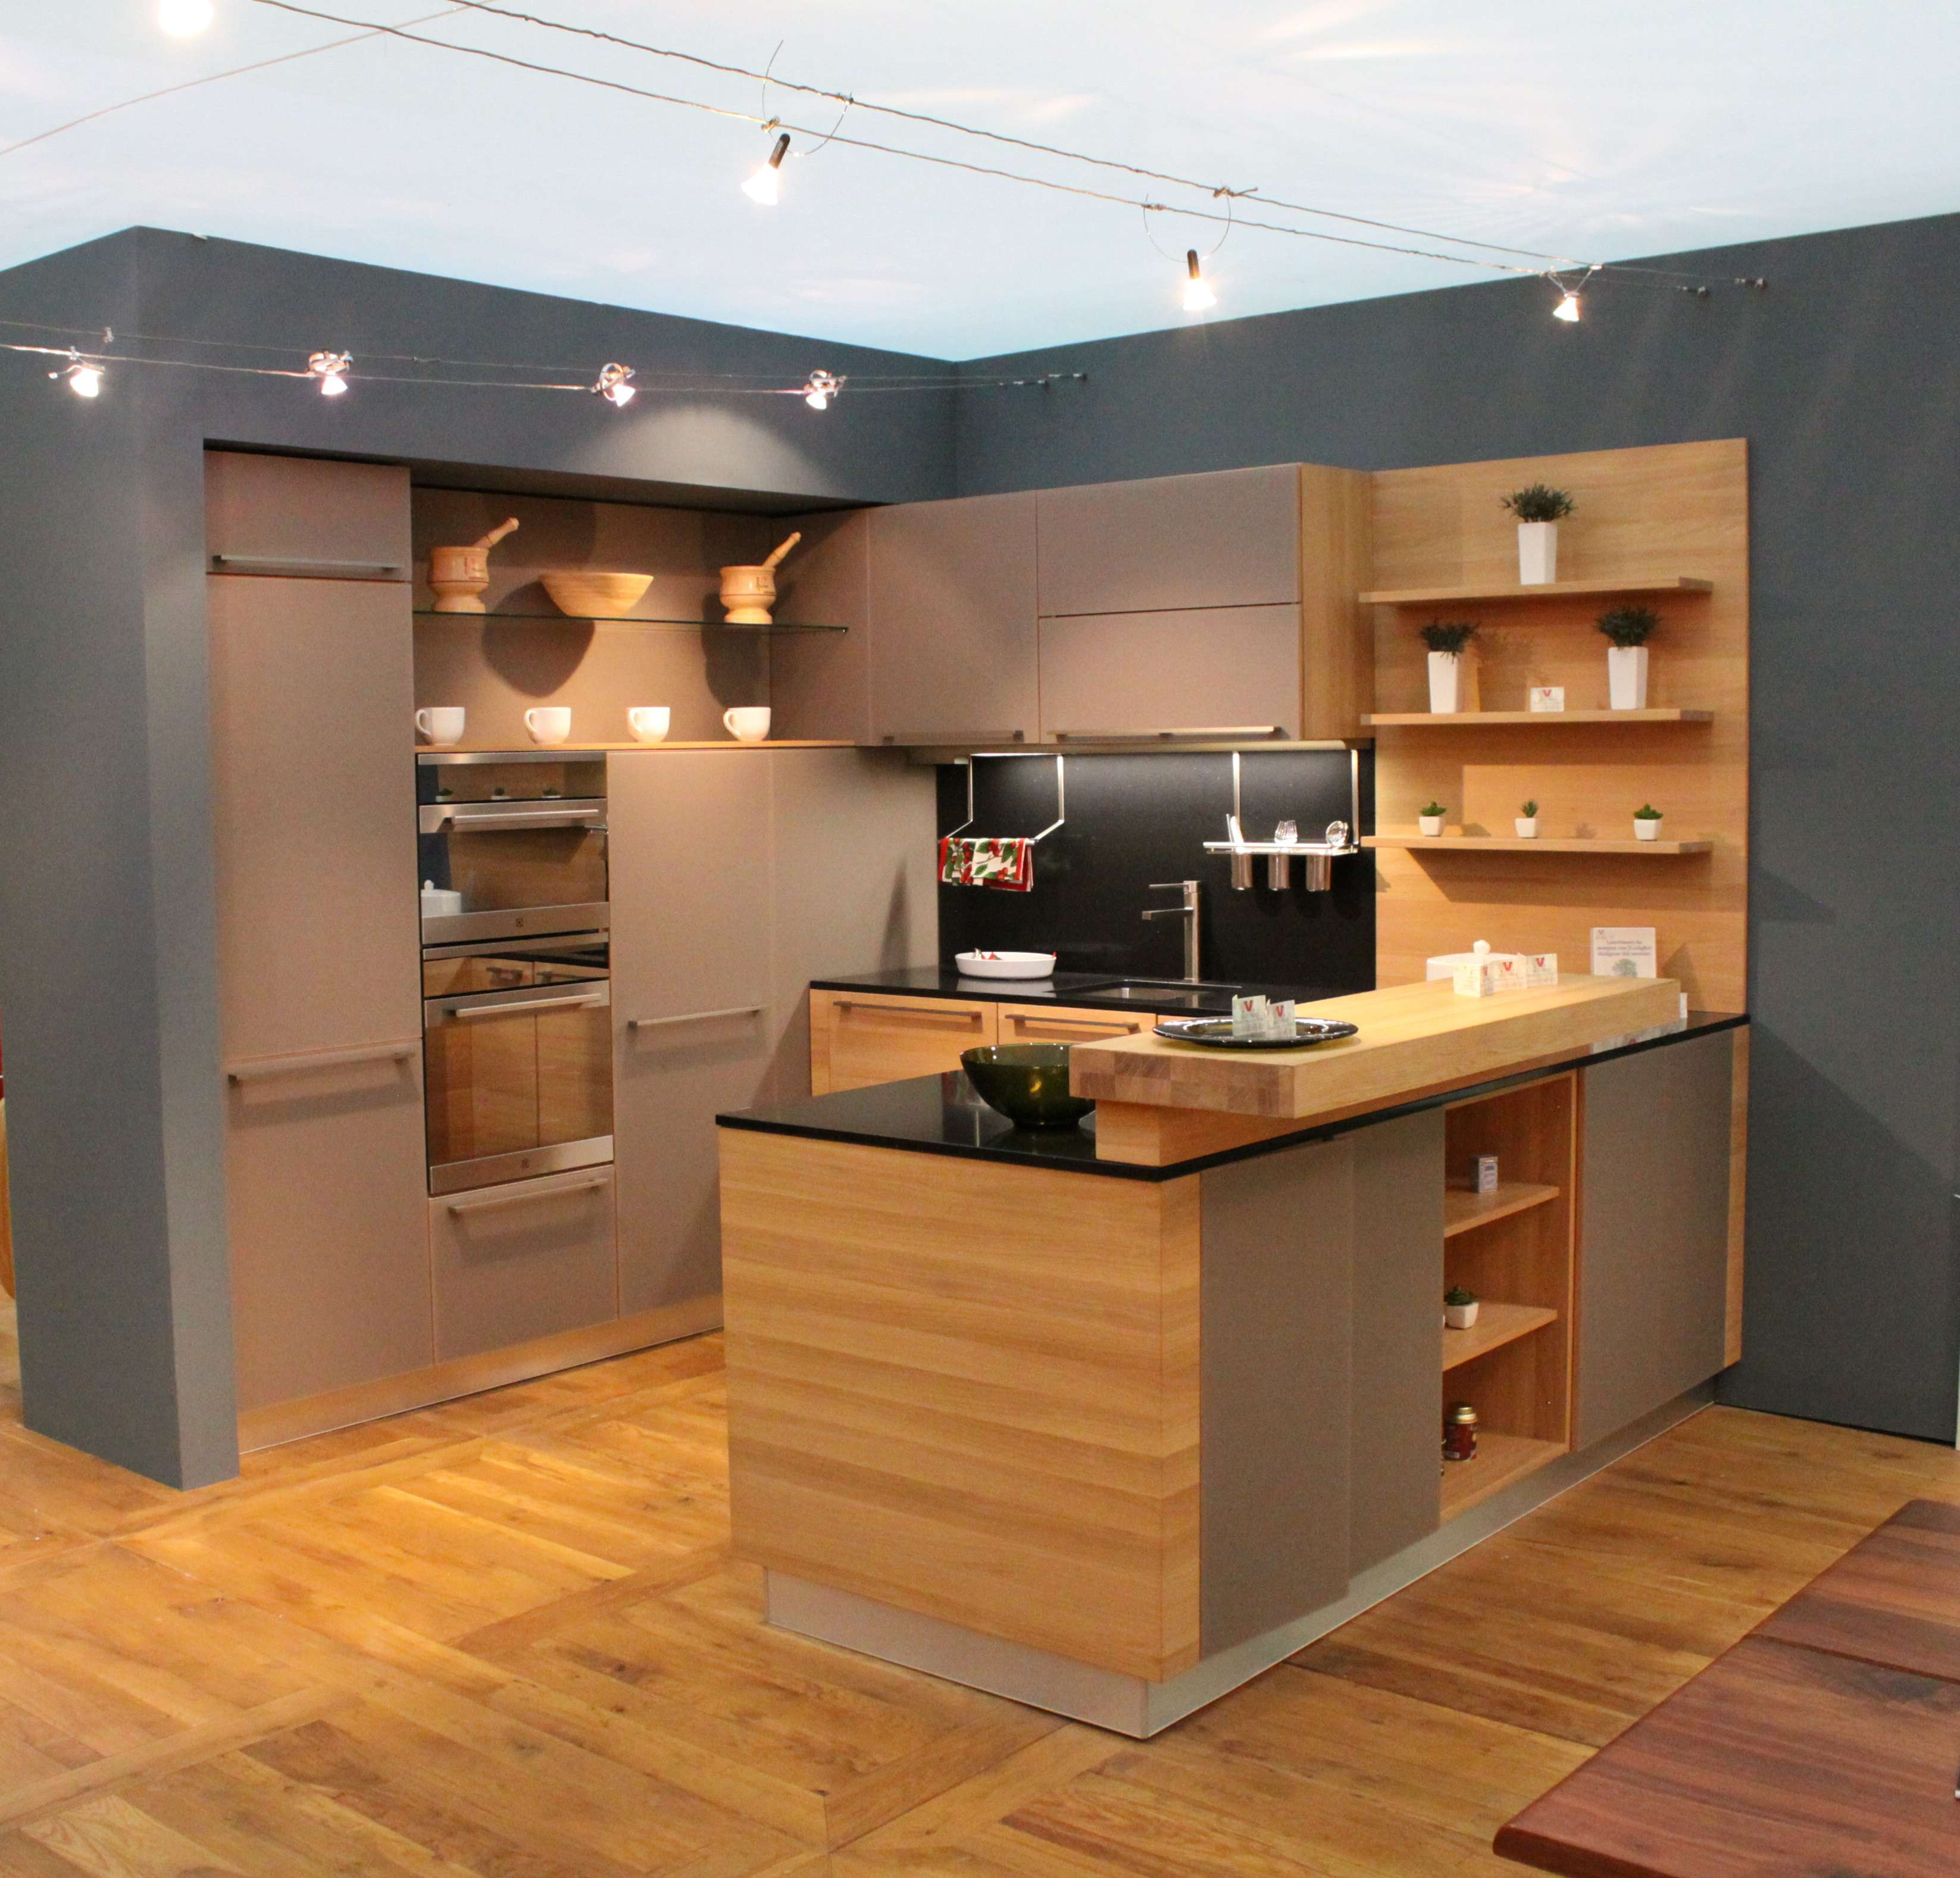 Offerte Cucine Moderne. Perfect Cucine Componibili Palermo Offerte ...